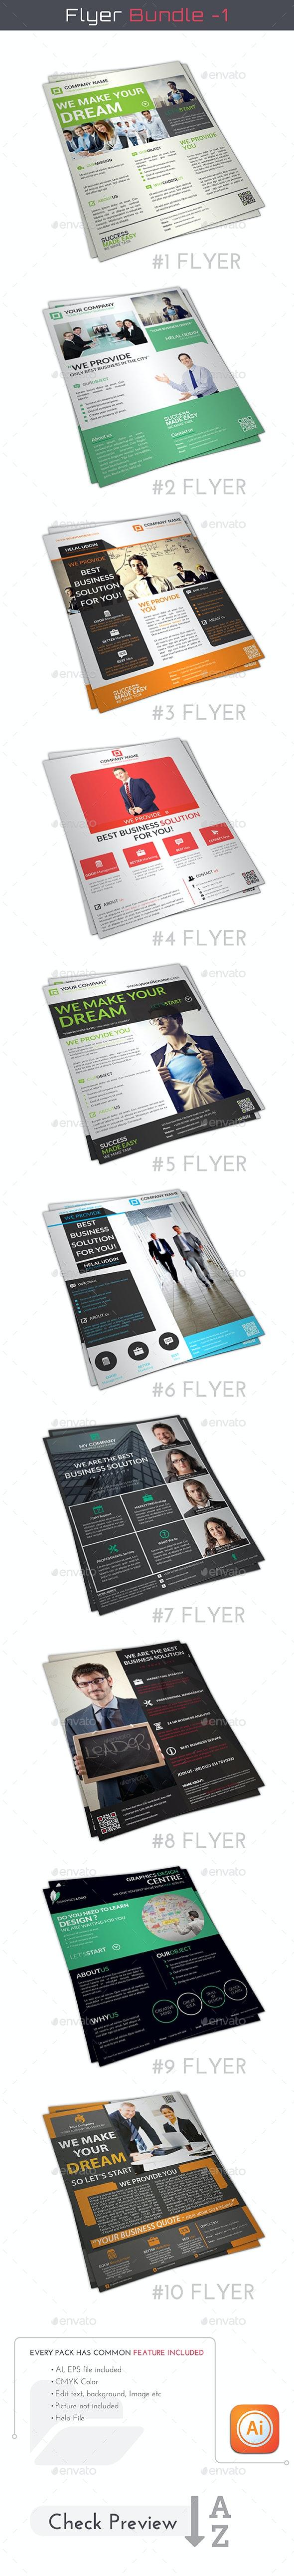 Corporate Flyer Bundle - Flyers Print Templates